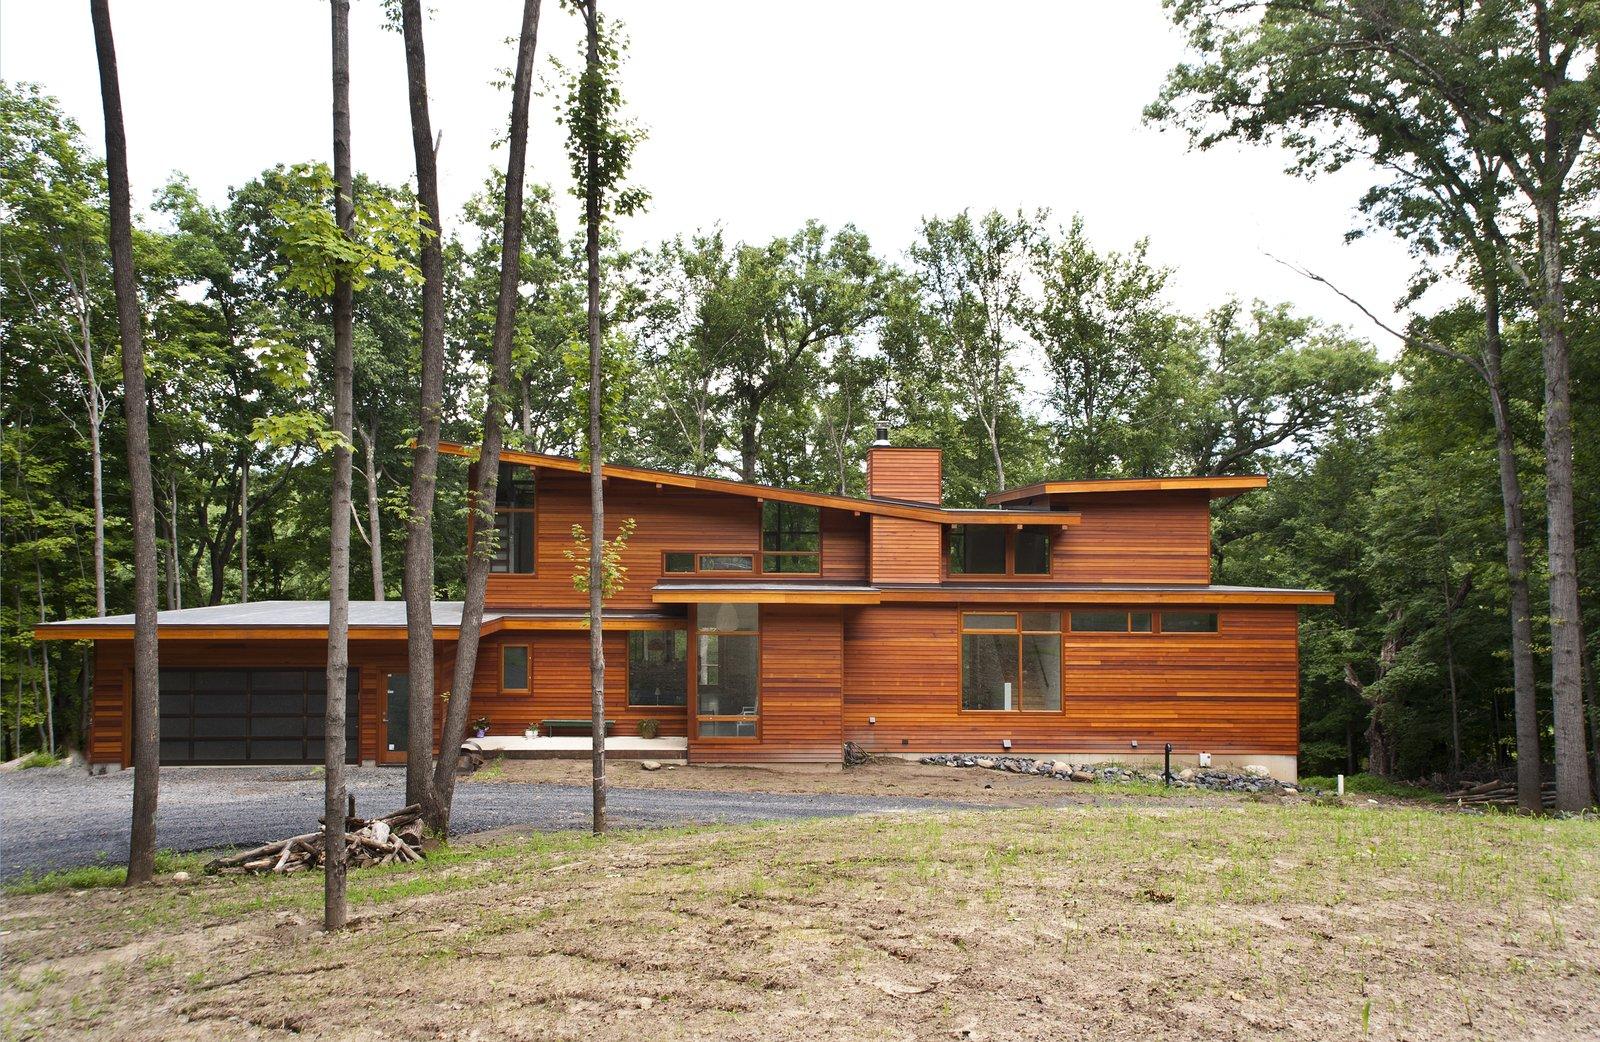 Photo by Deborah DeGraffenreid  Prefab Homes by Dwell from Wallkill River House